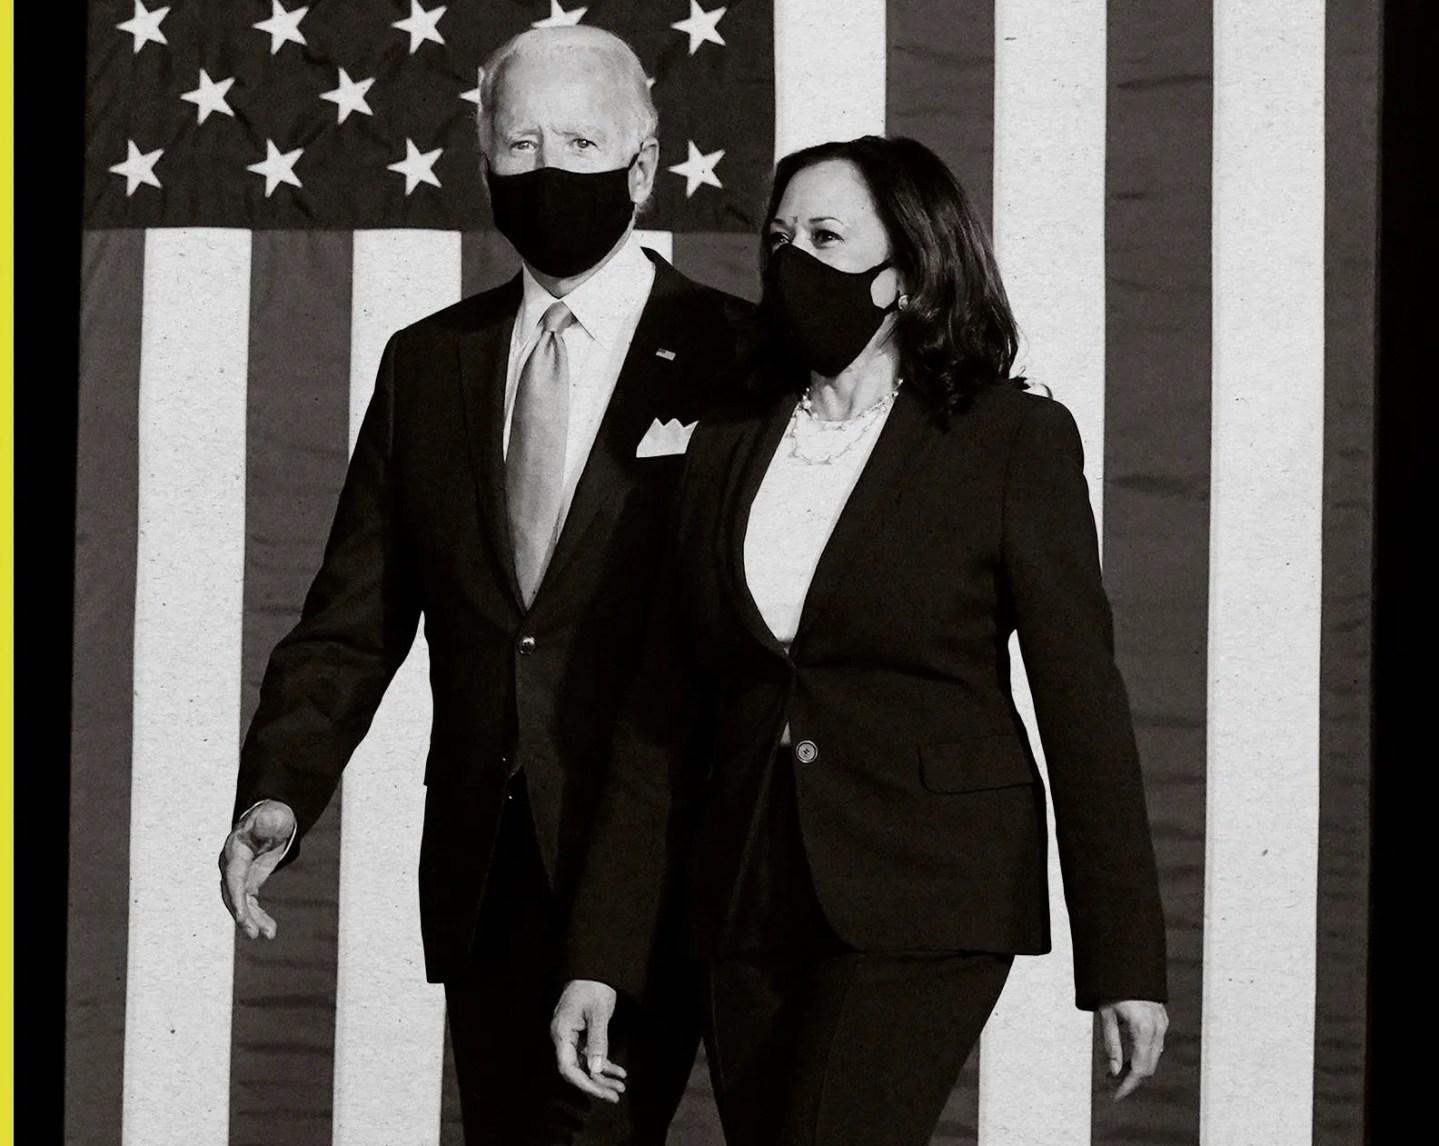 Joe Biden and Kamala Harris in Wilmington, Del., Aug. 12, 2020.